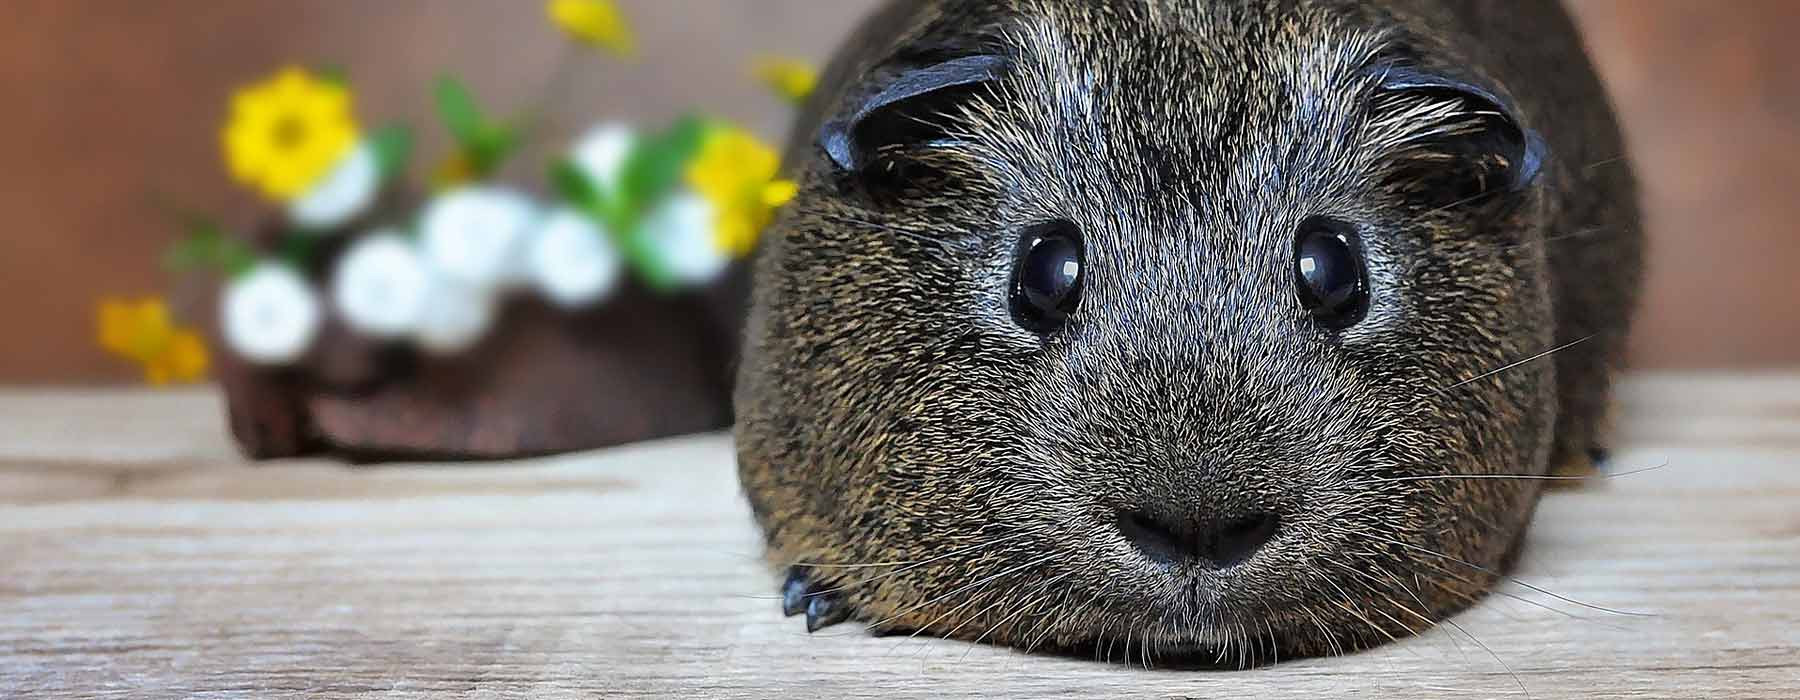 cute grey guinea pig relaxing